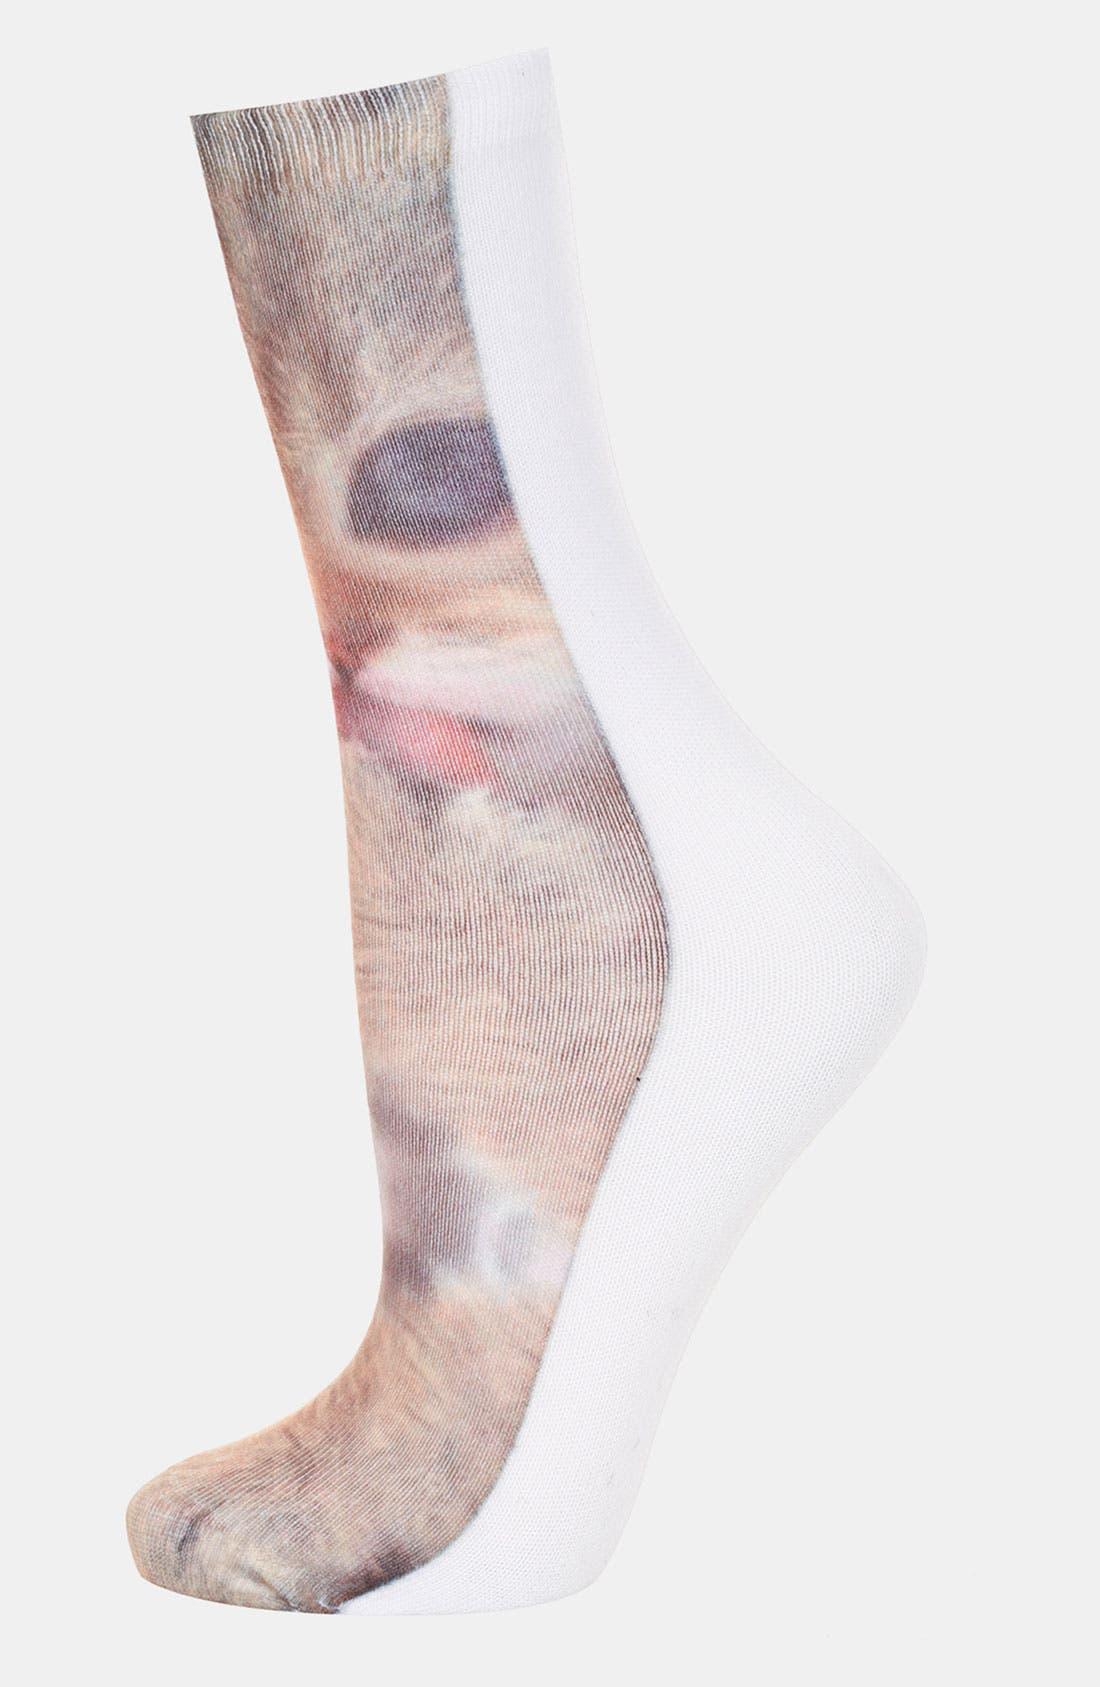 Alternate Image 1 Selected - Topshop 'Cheeky Kitten' Socks